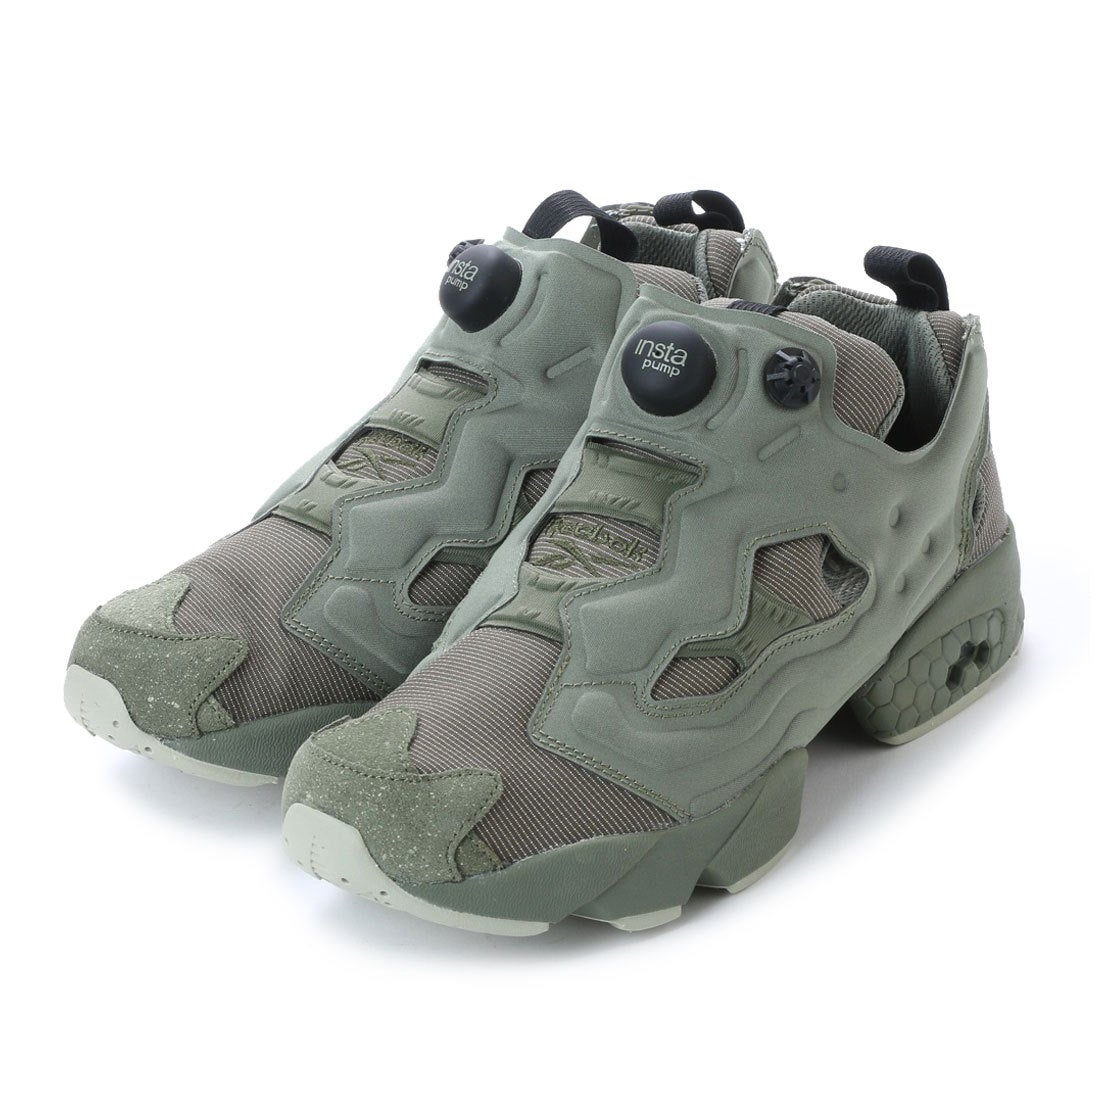 4e2e13d41e68e リーボック REEBOK インスタ ポンプ フューリー MTP (ハンターグリーン×グレー×ティール) -靴&ファッション通販  ロコンド〜自宅で試着、気軽に返品